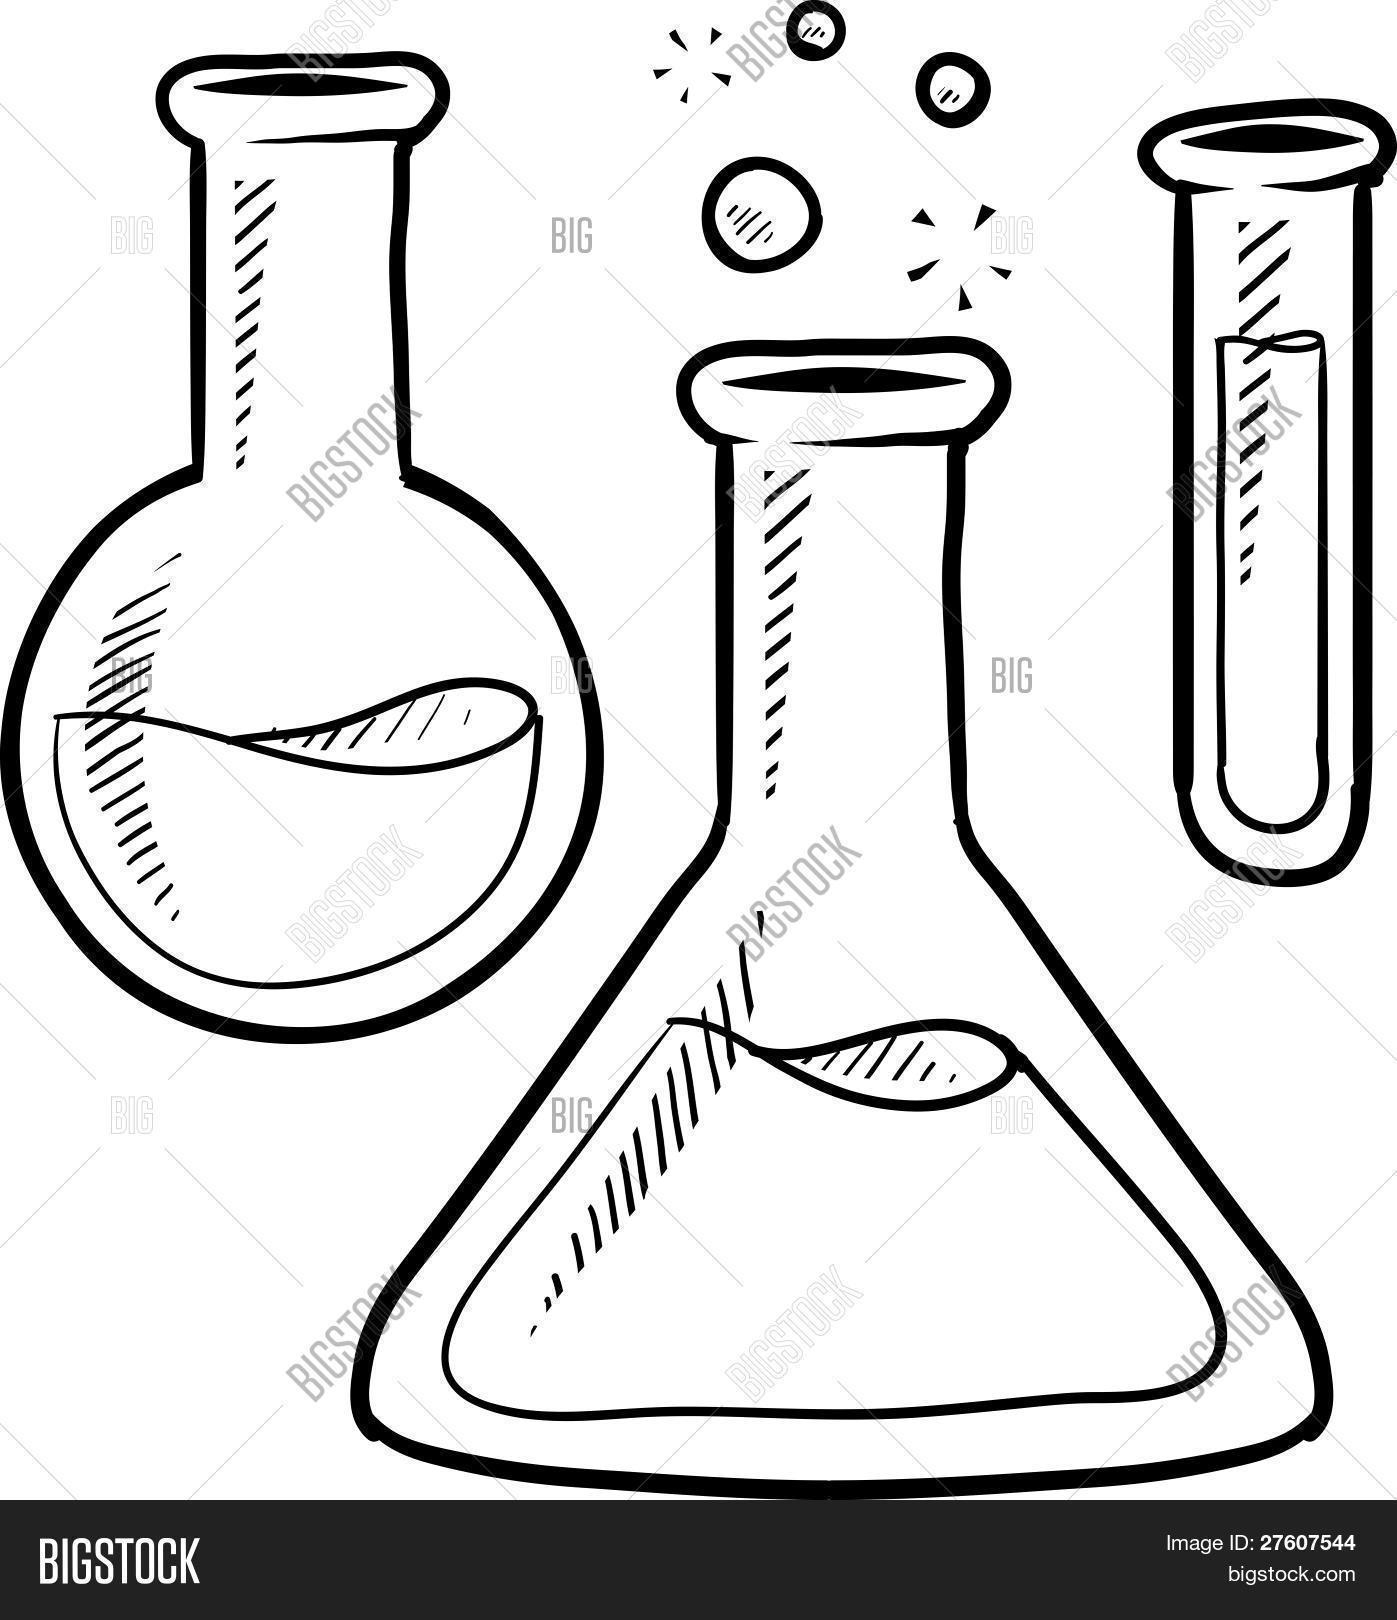 Beaker clipart science tool. Drawing at getdrawings com